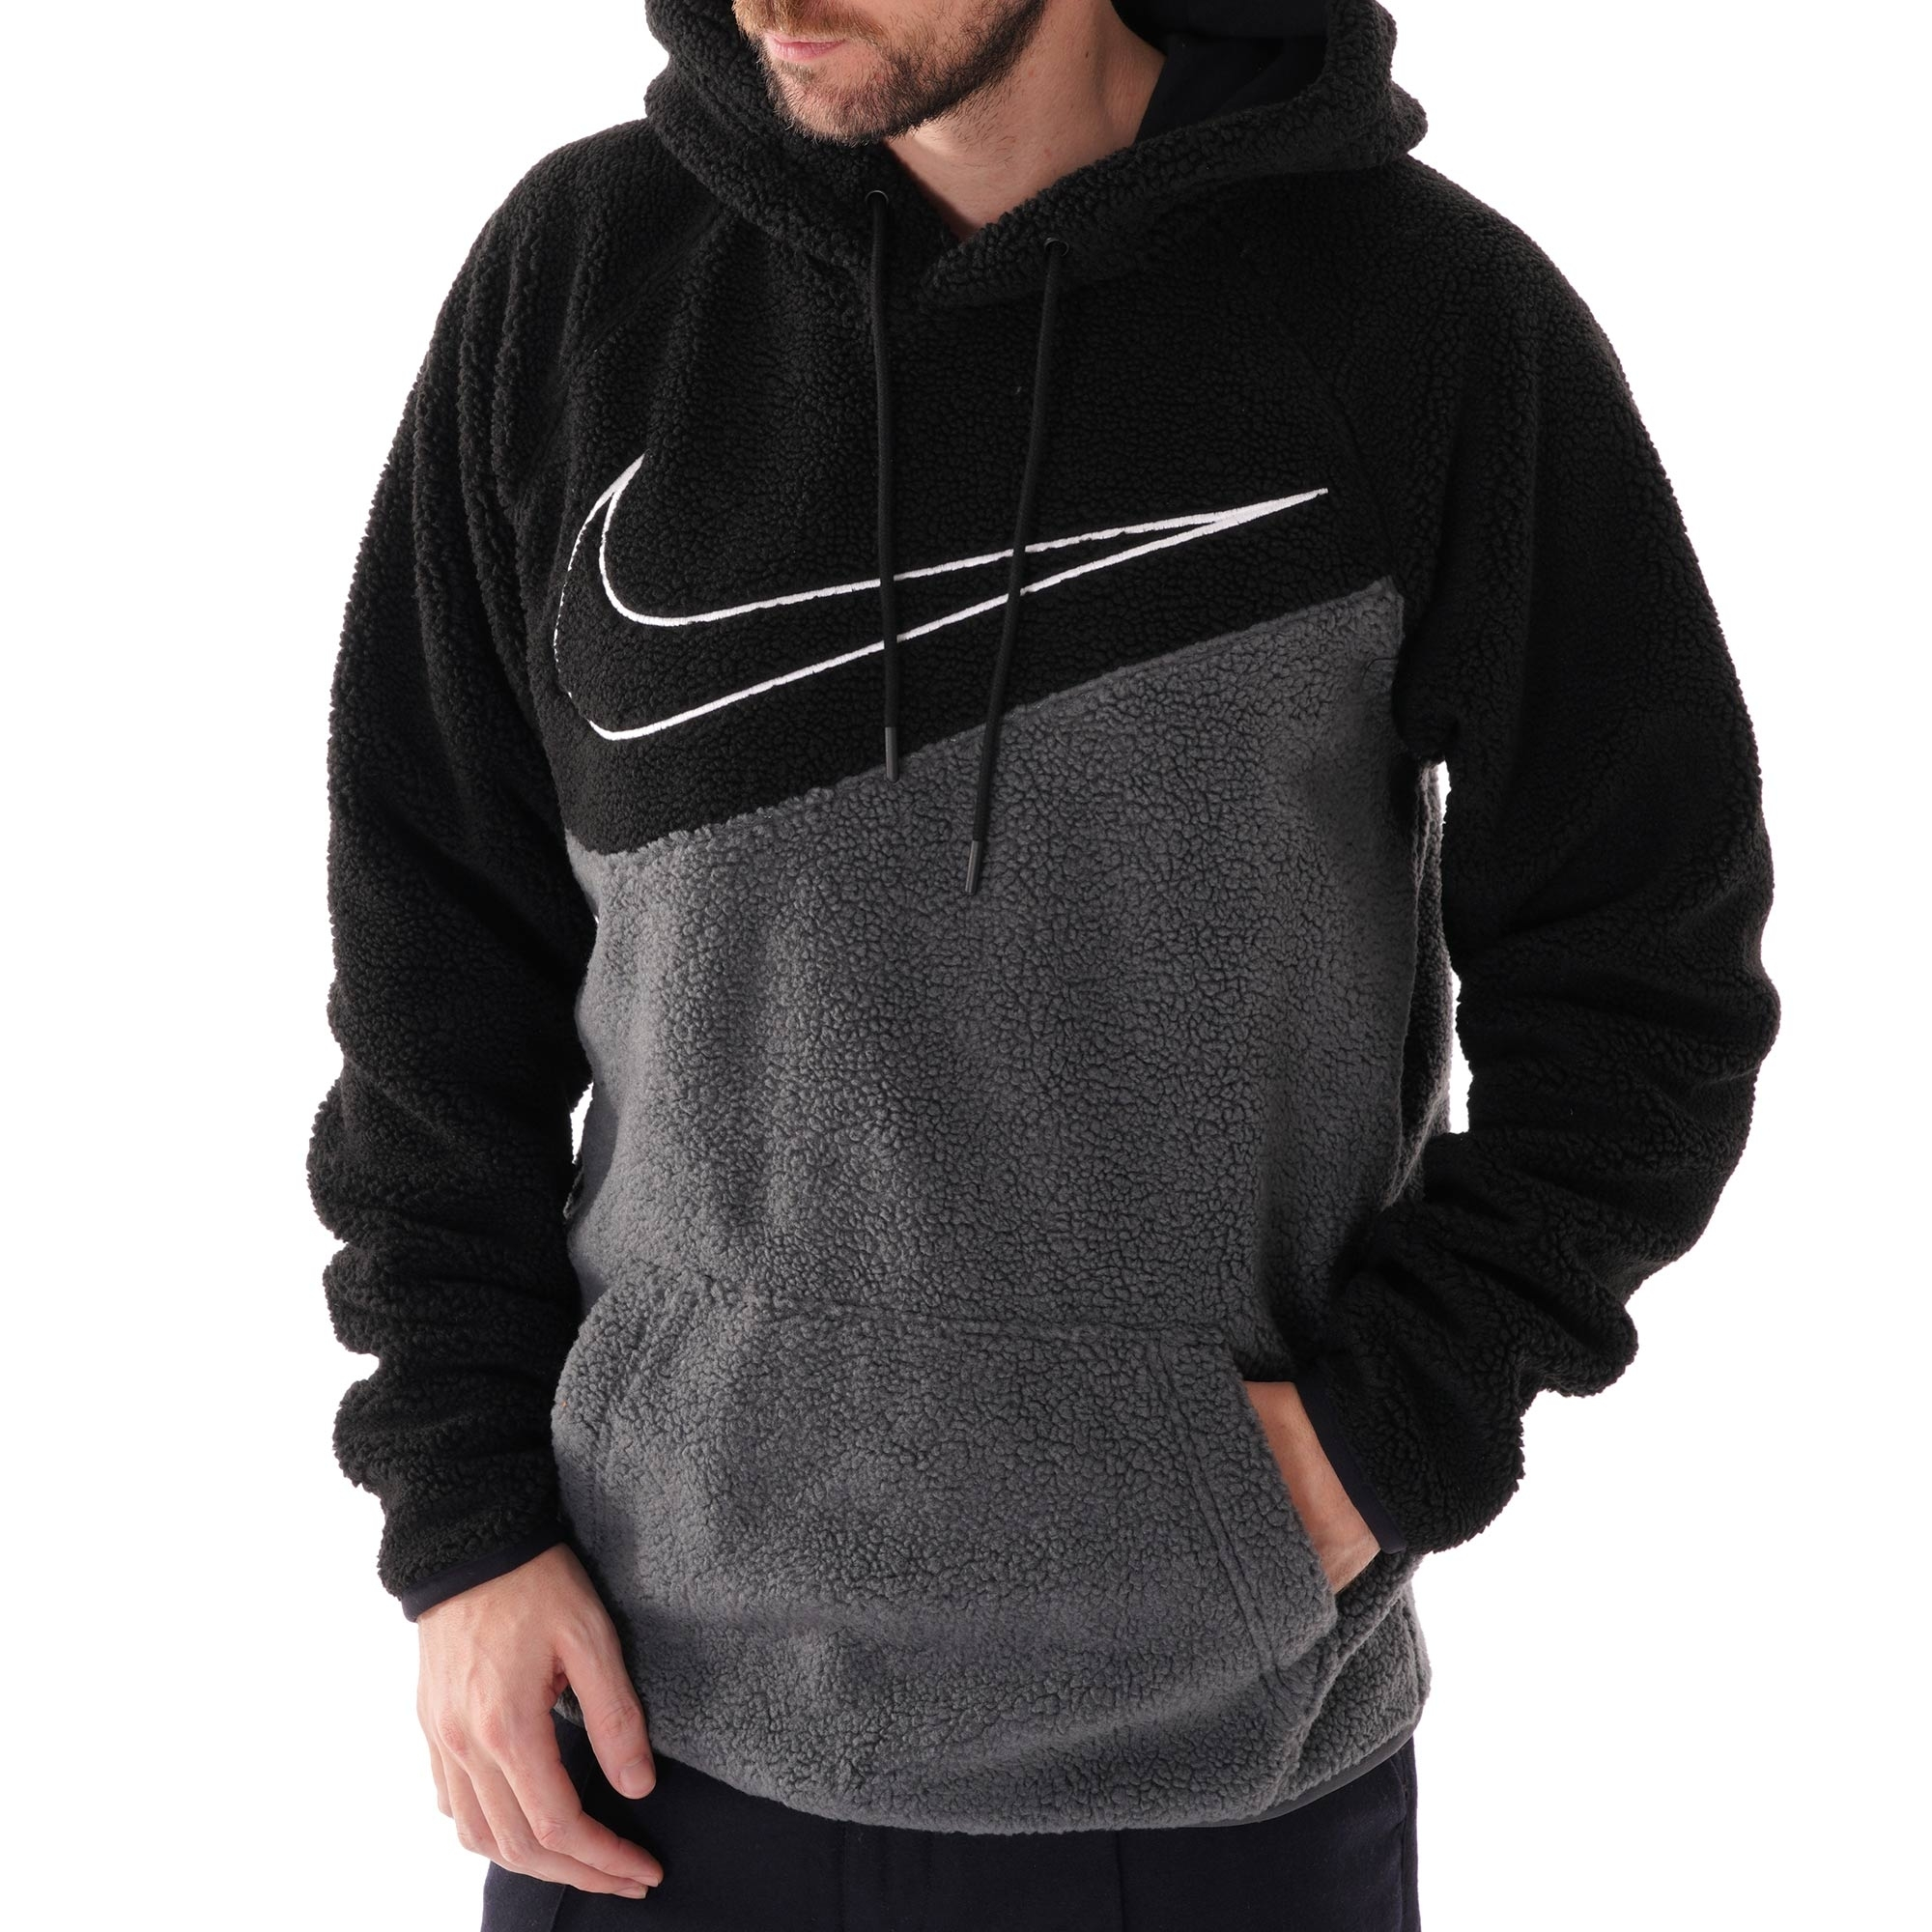 buy online purchase cheap classic shoes Nike Swoosh Fleece Hoodie (Black) BV5314-010